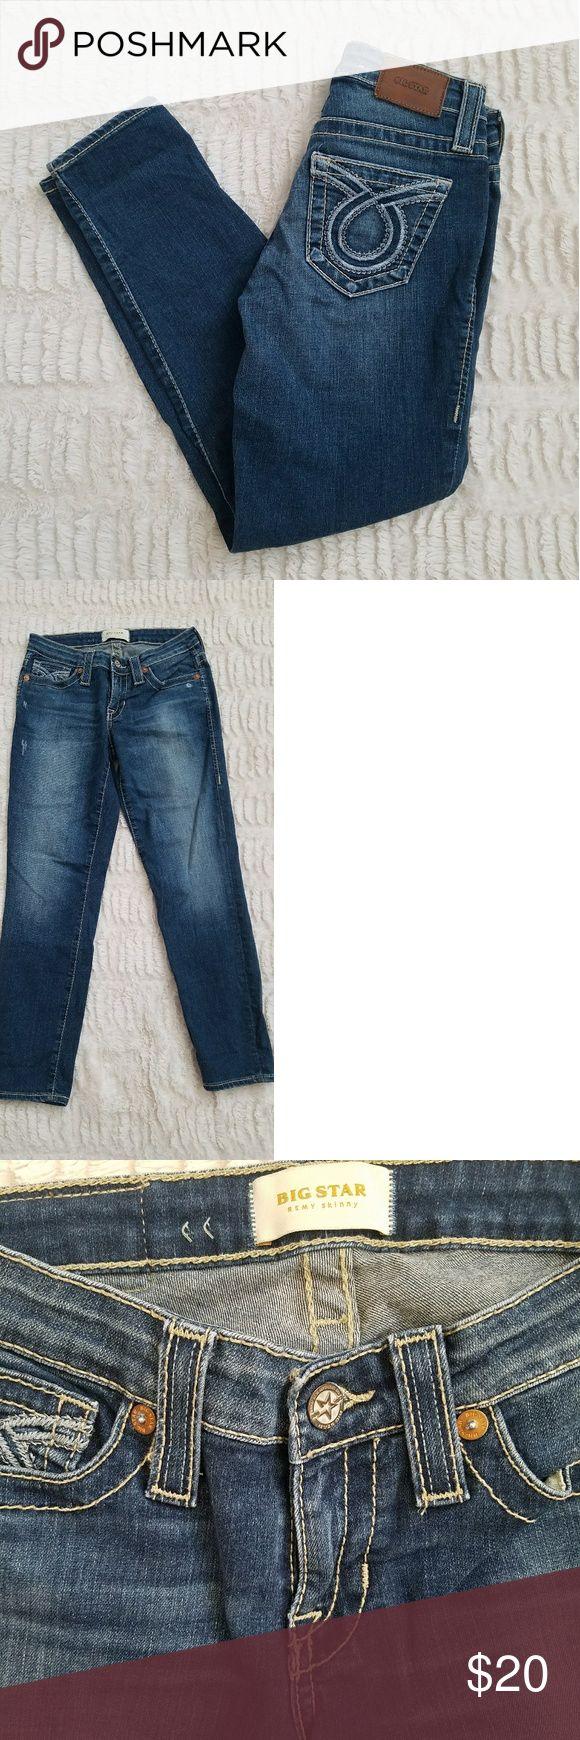 FINAL-Big star skinny jeans Big star Remy skinny jeans 25x25 Big Star Jeans